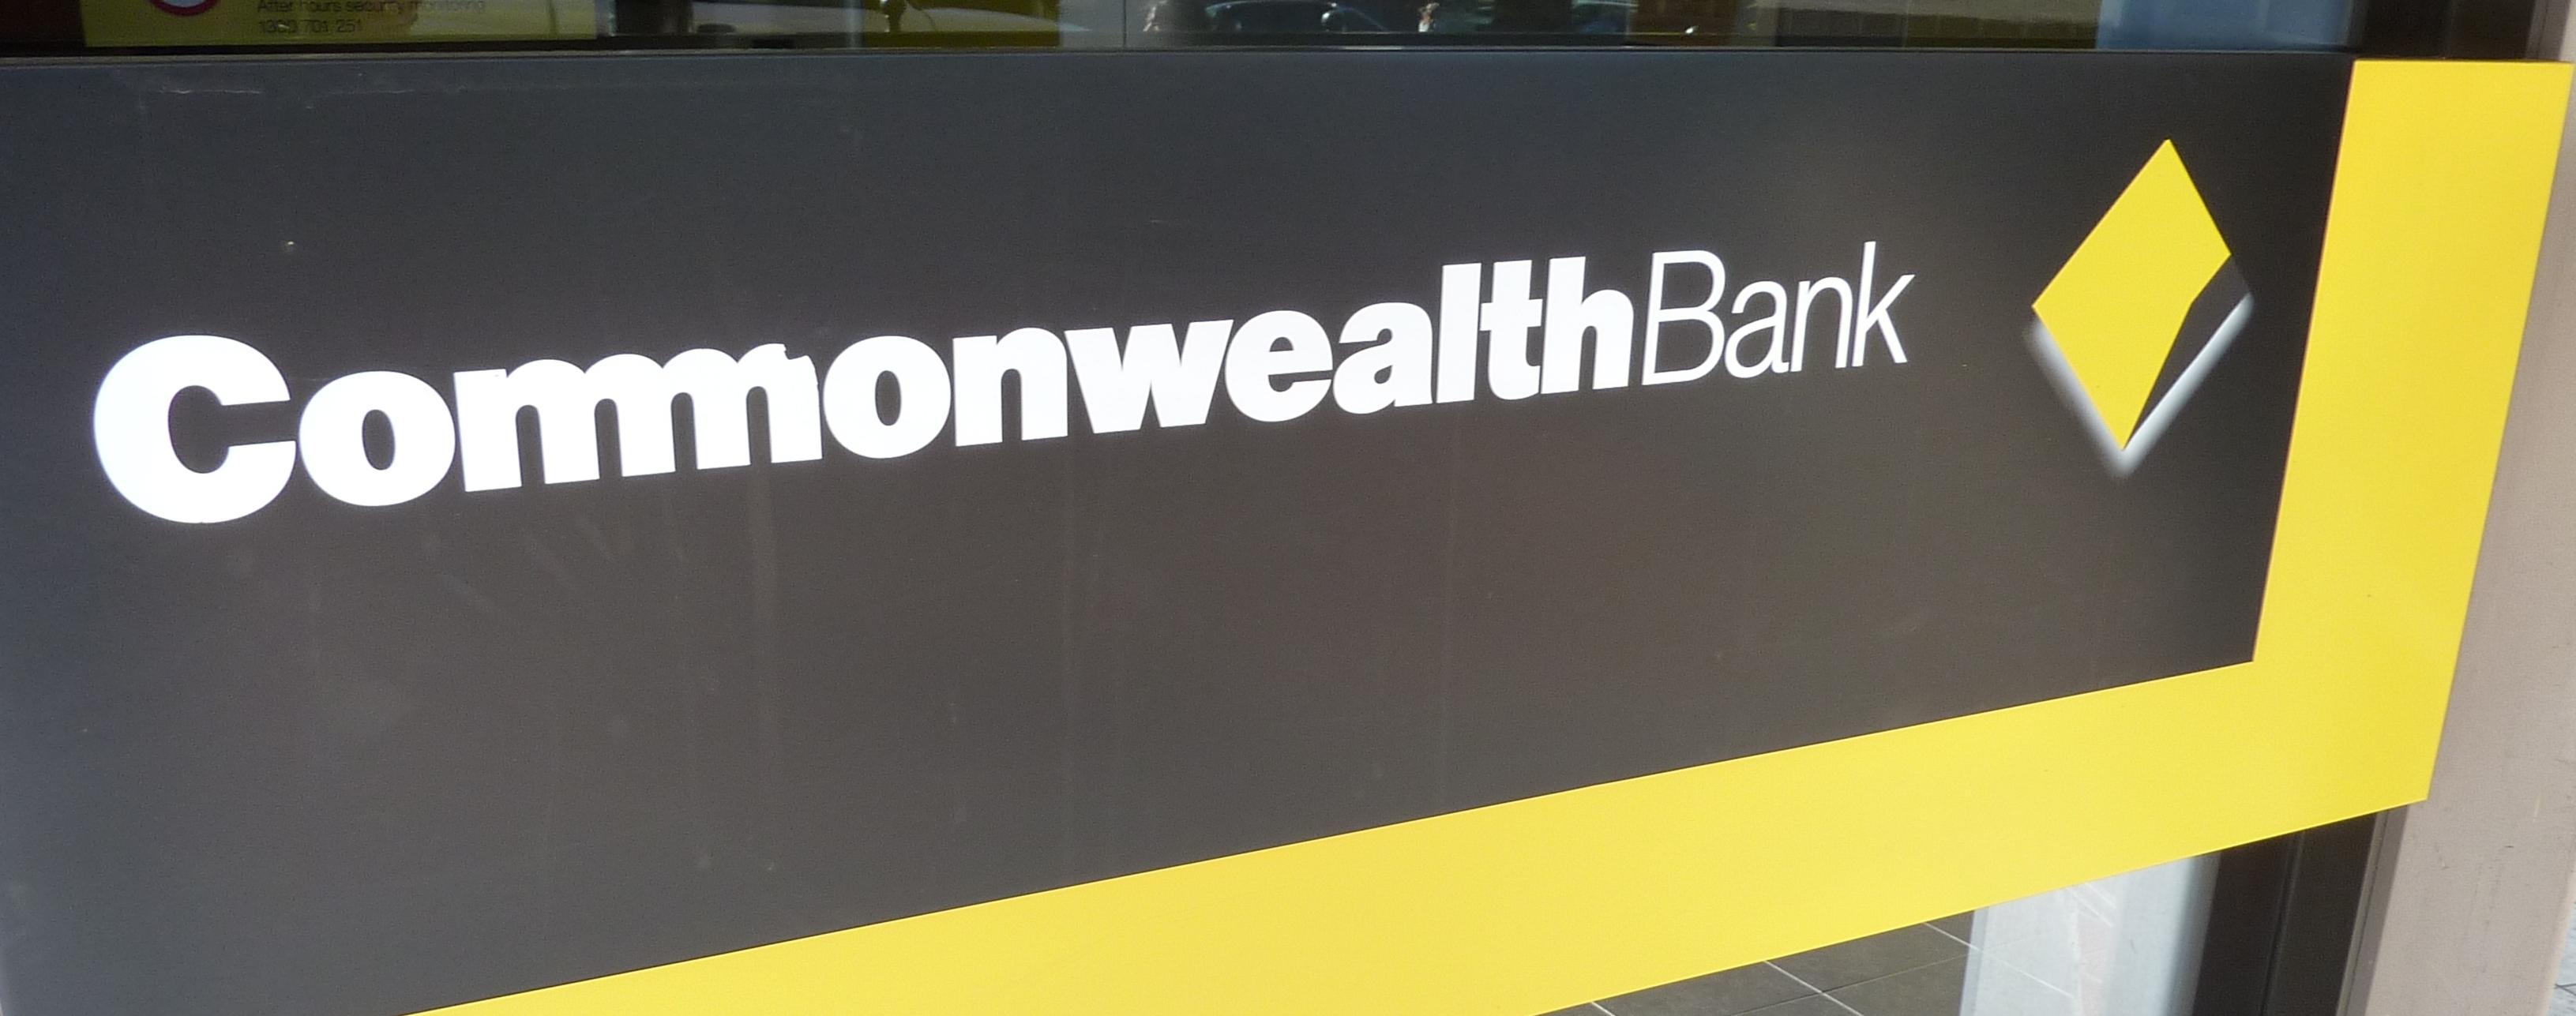 Trophy Western Sydney Bank Investment